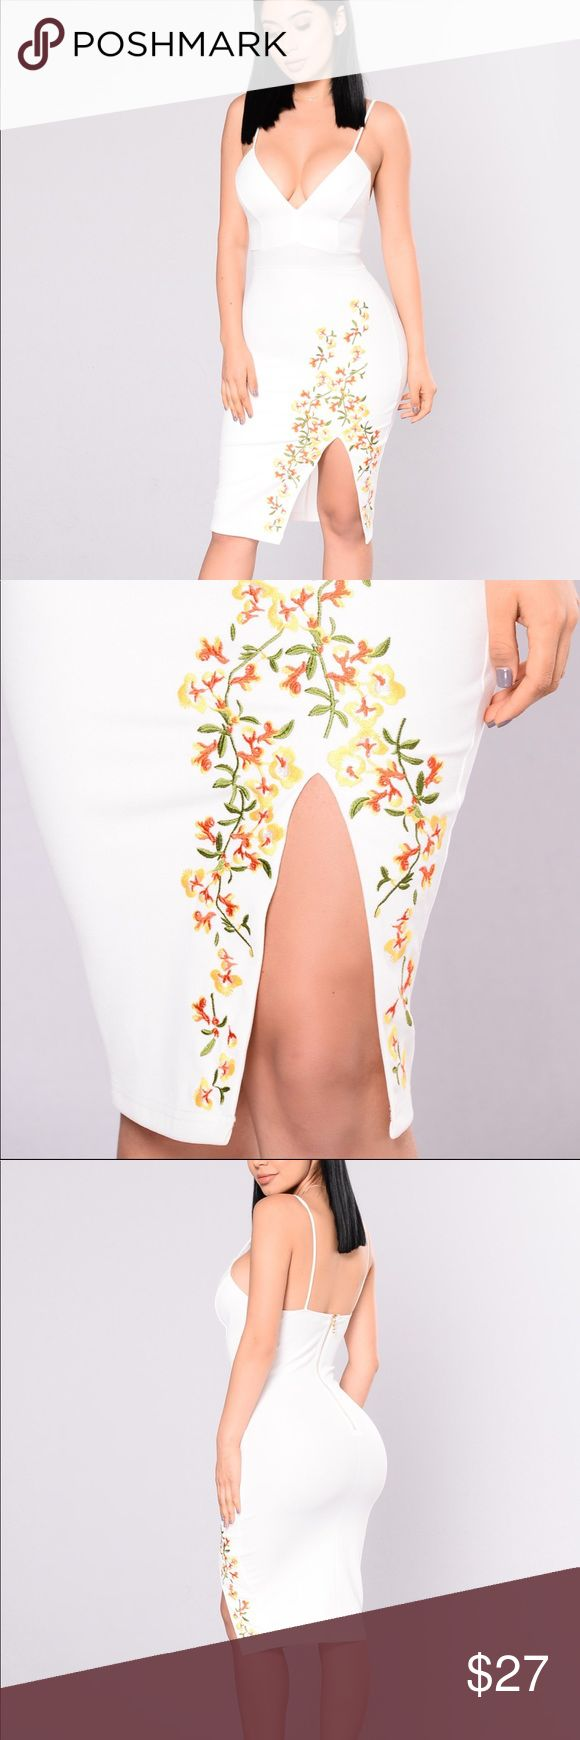 ✨Preblack frieday sales✨Cute dress Are taking any offers (no trades) Fashion Nova Dresses Midi